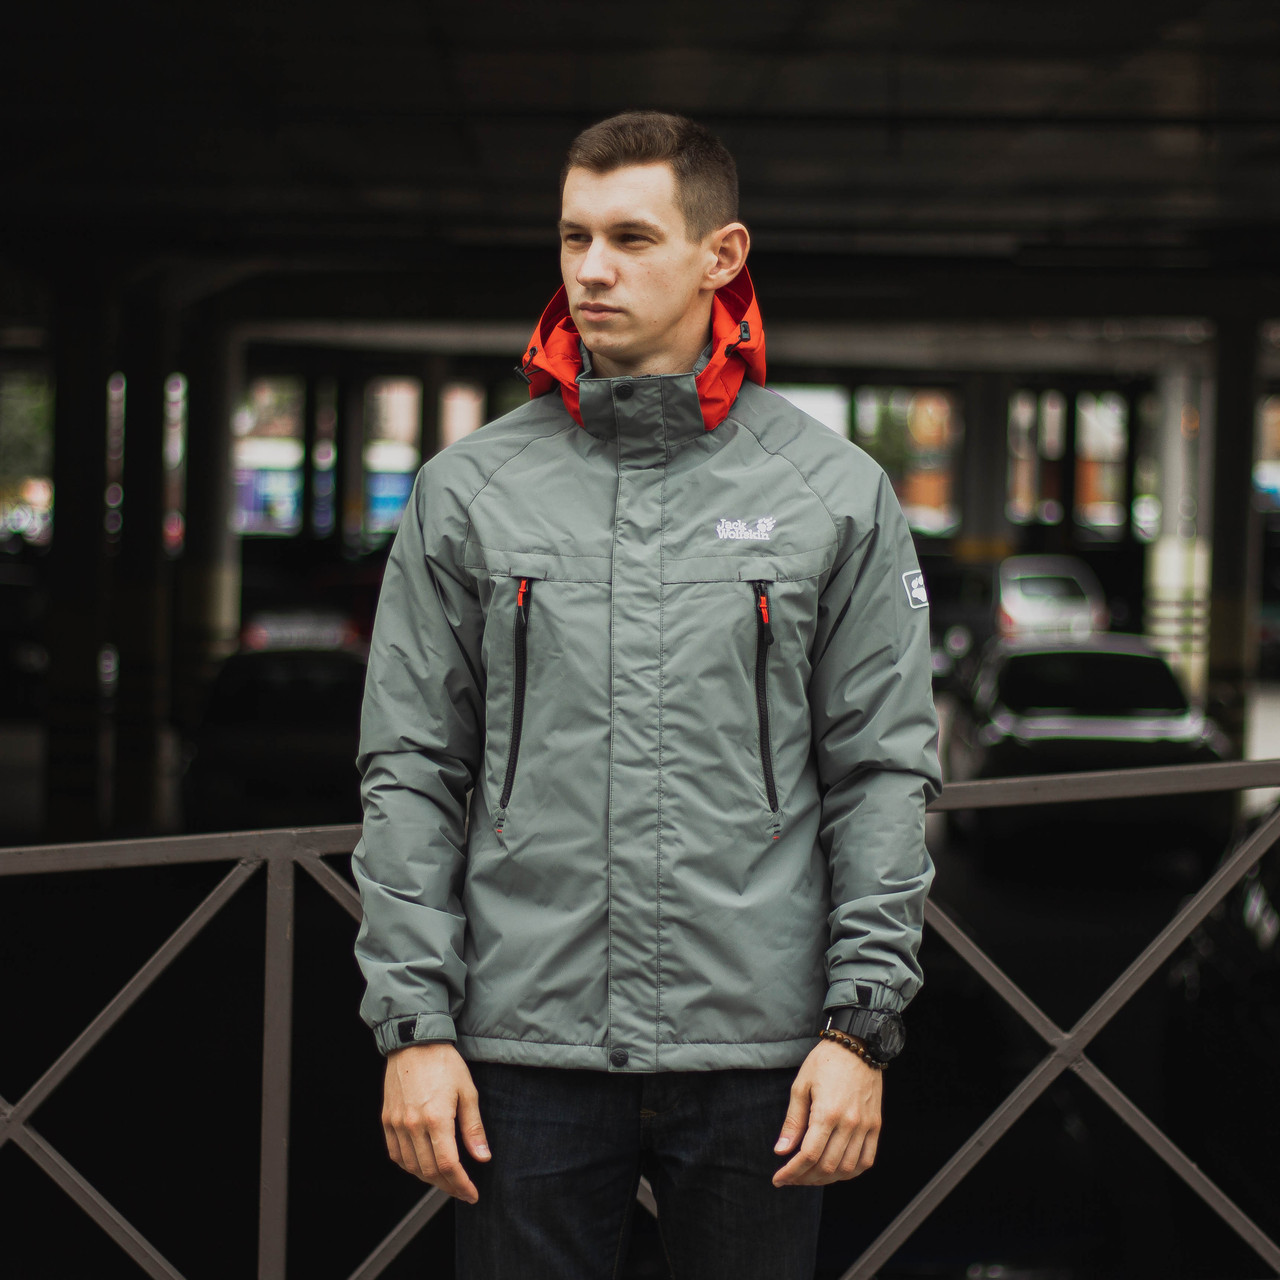 Демисезонная куртка мужская модель Jack Wolfskin размер M, L, XL, XXL